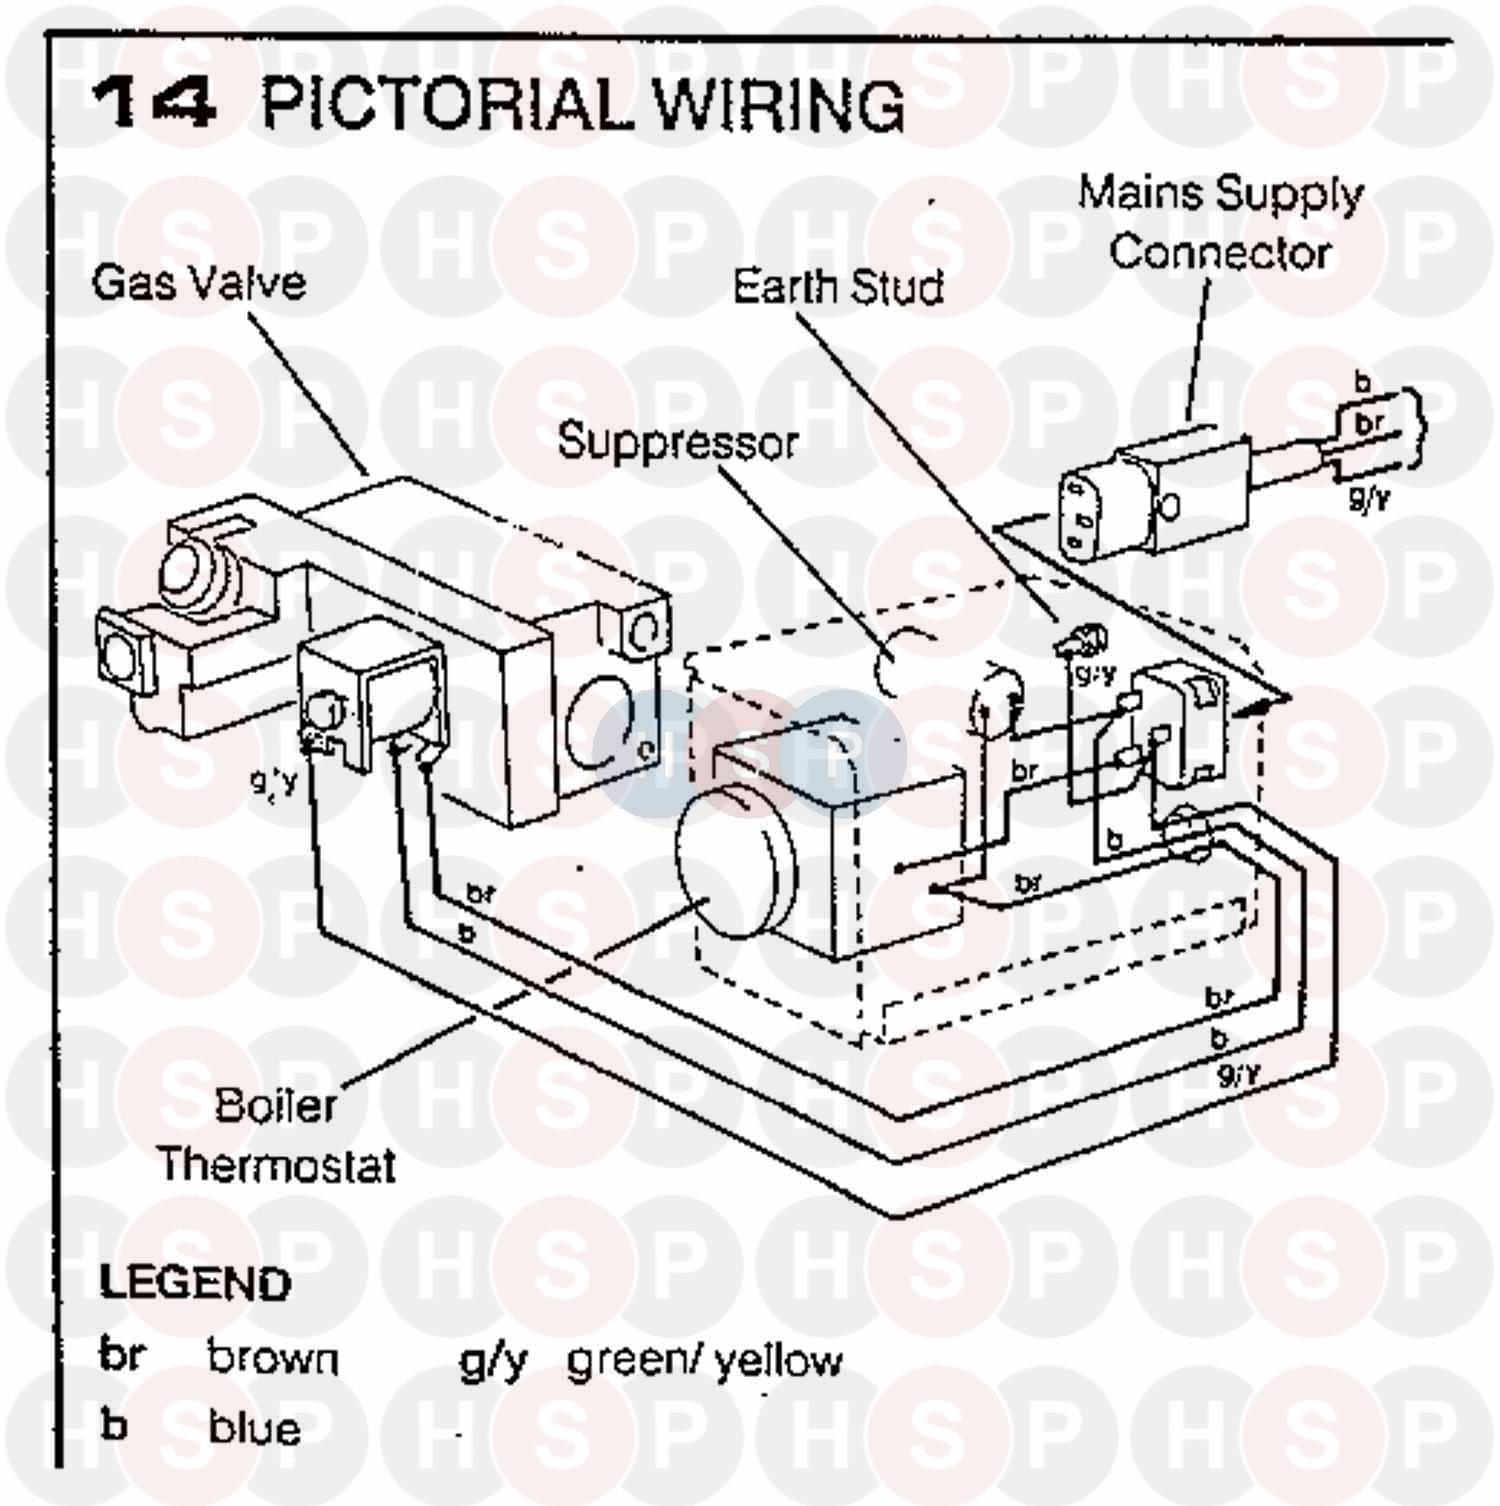 Ideal W2000 CF 45NP Appliance Diagram (Wiring Diagram 1